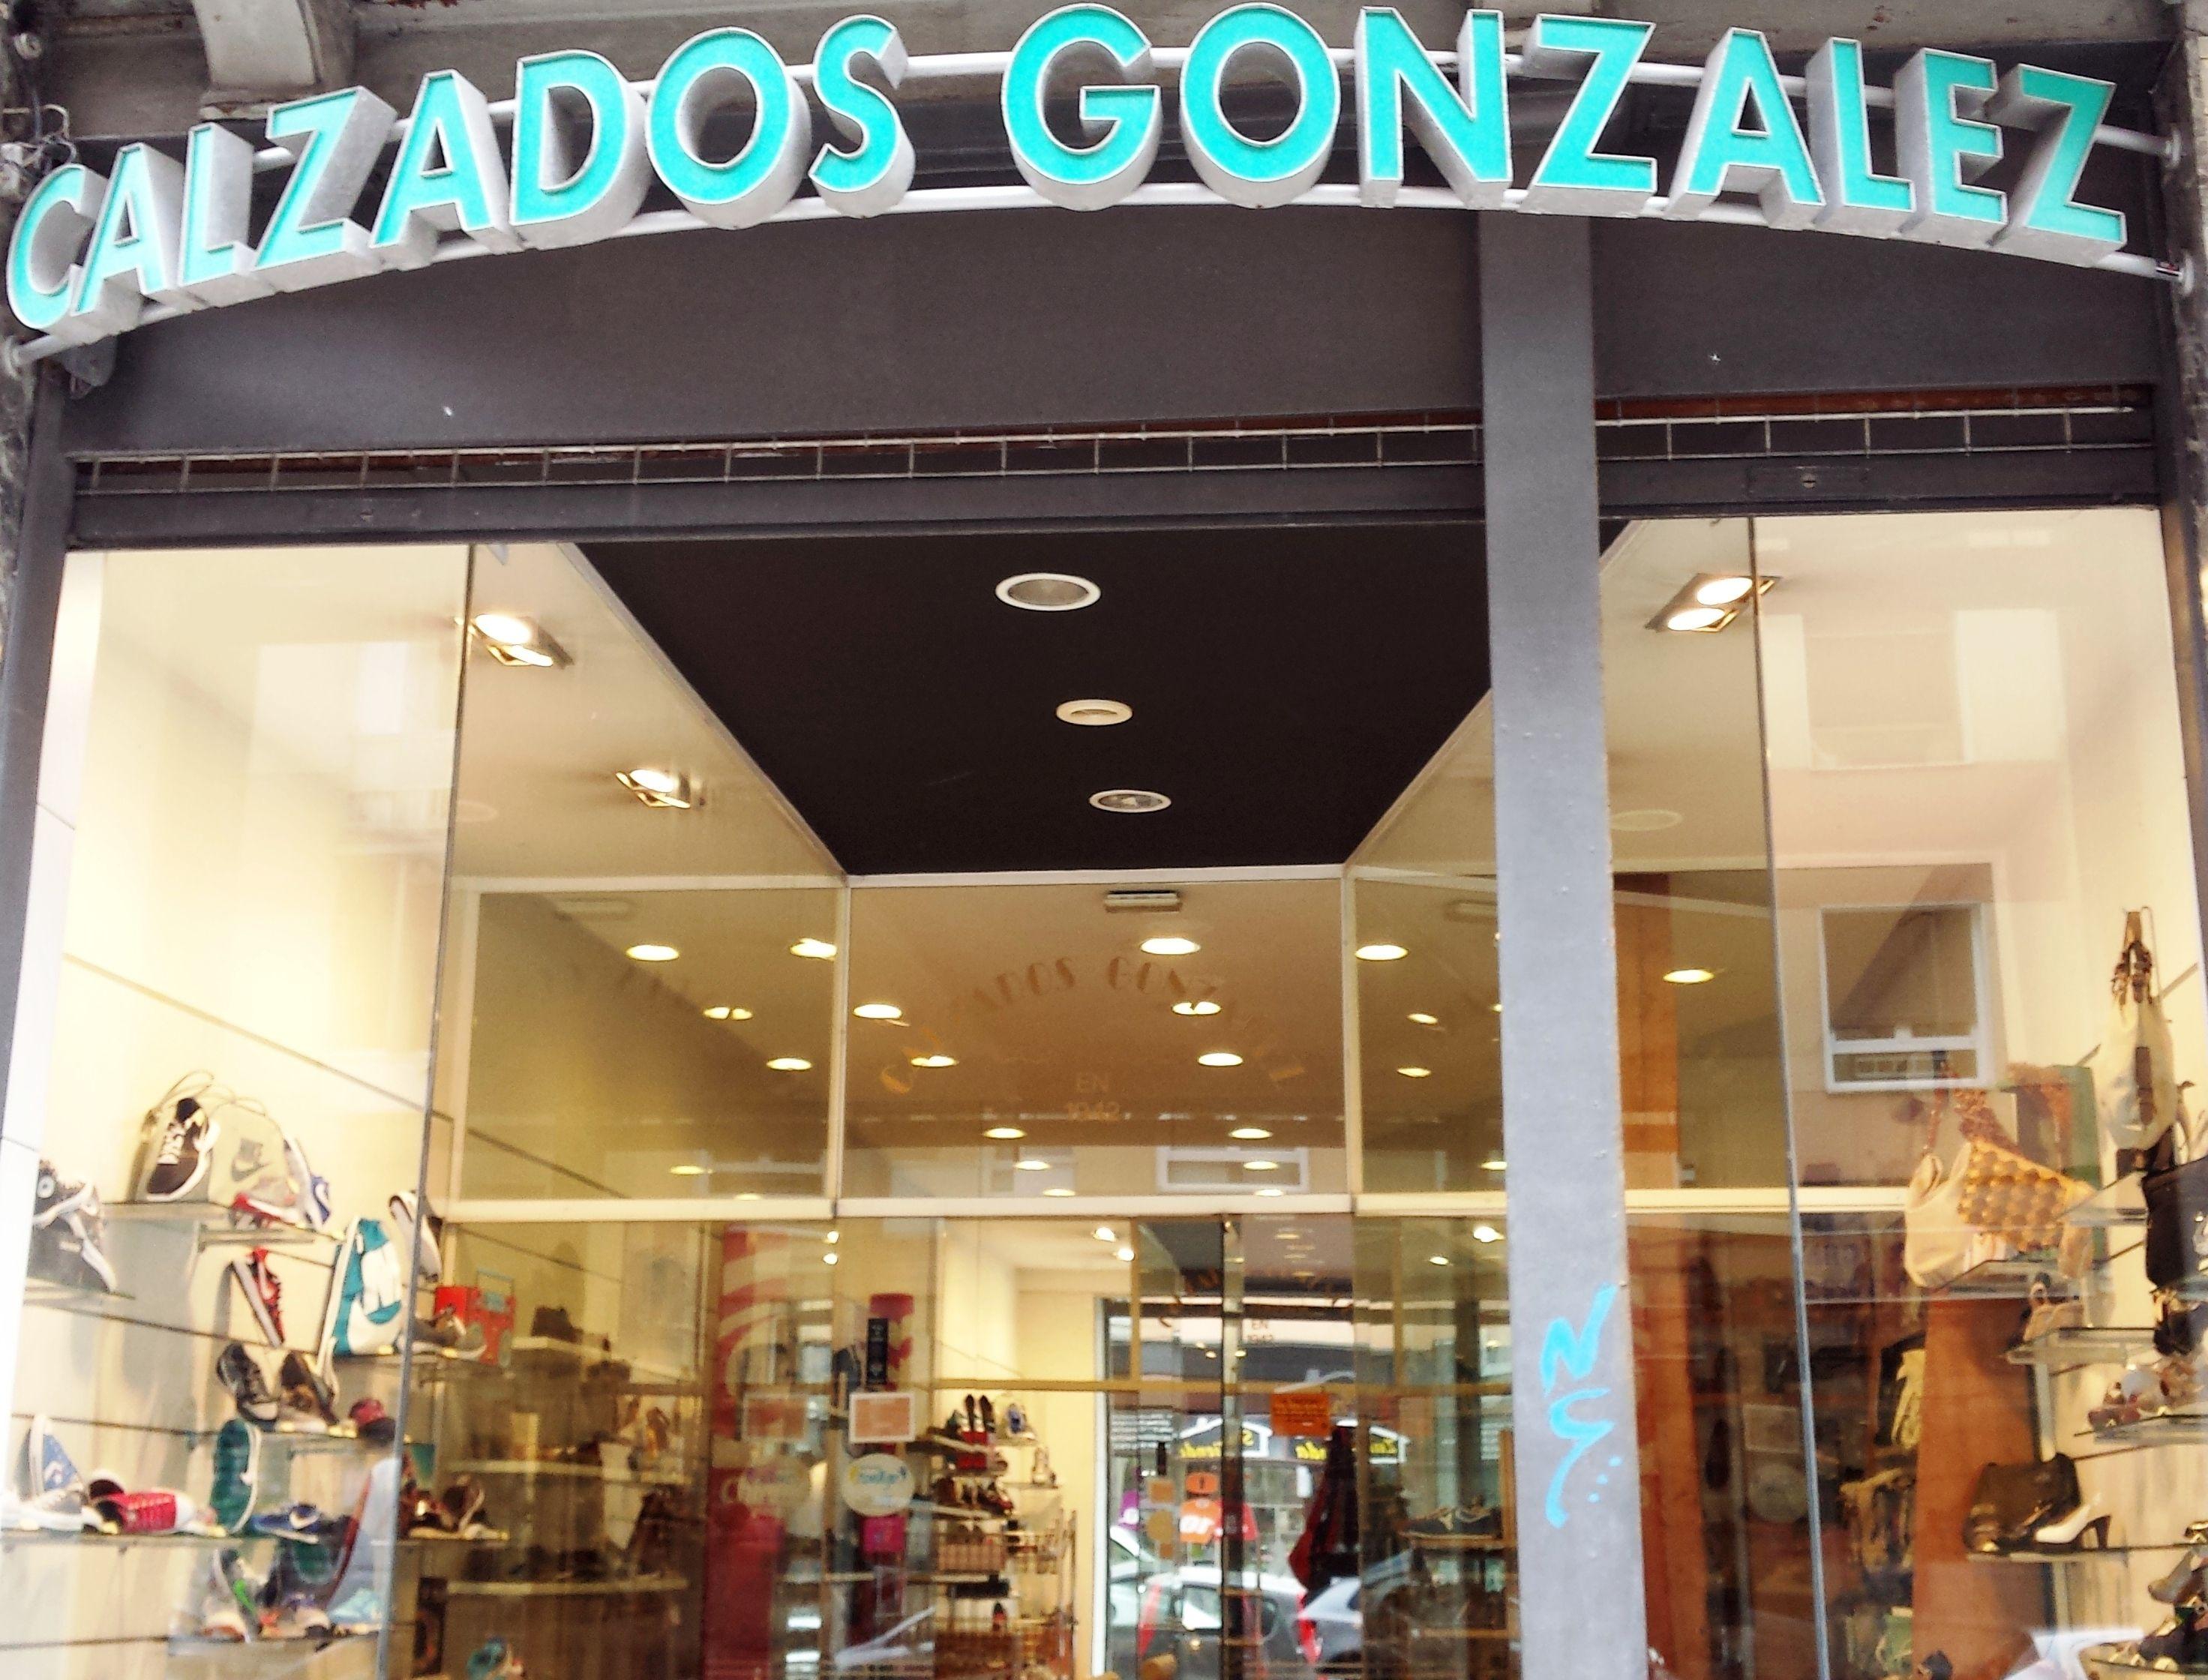 Calzados González